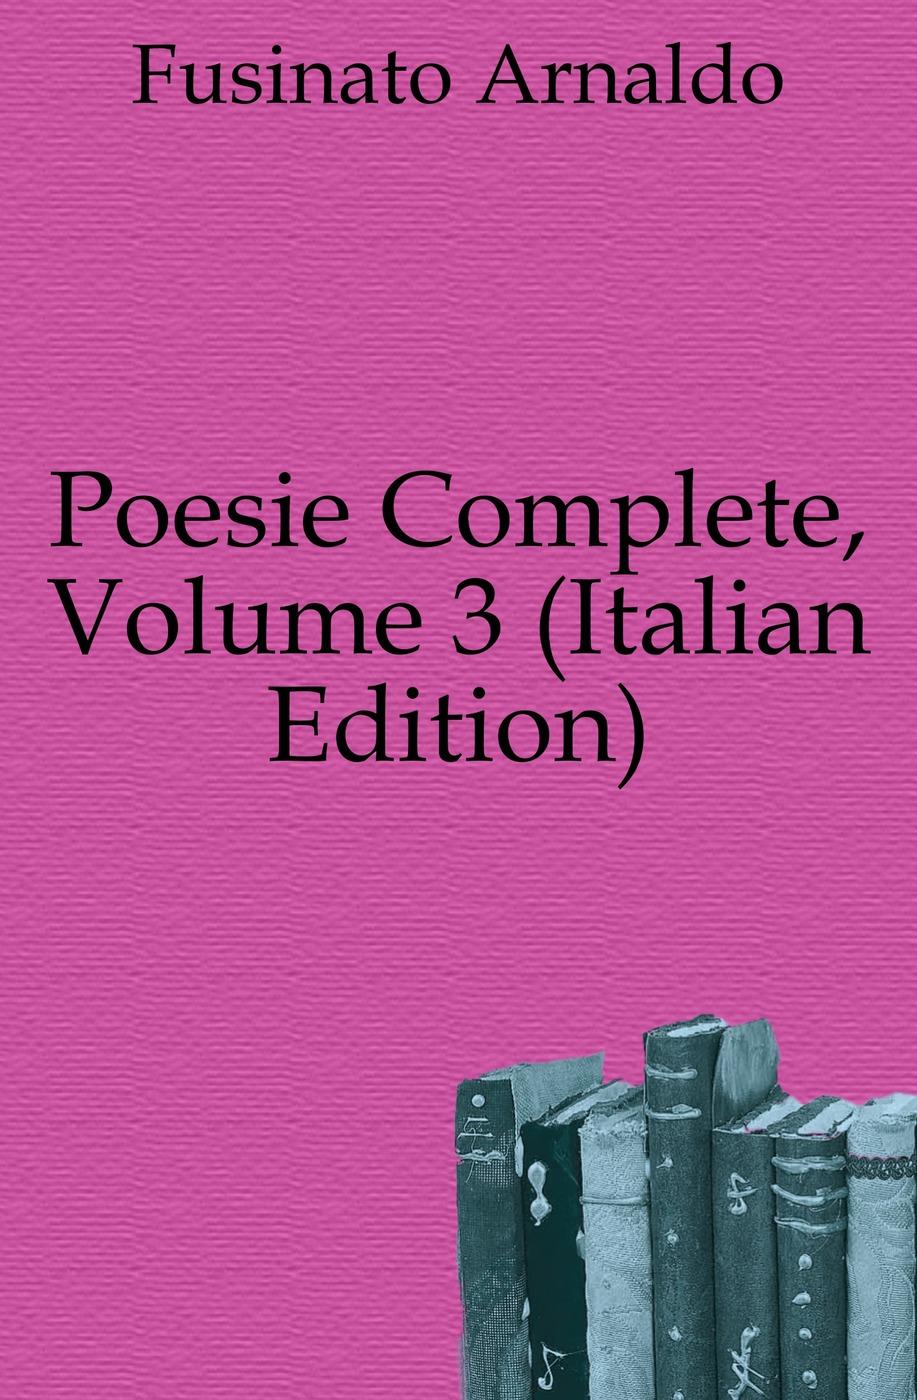 Fusinato Arnaldo Poesie Complete, Volume 3 (Italian Edition) fuà fusinato erminia versi italian edition